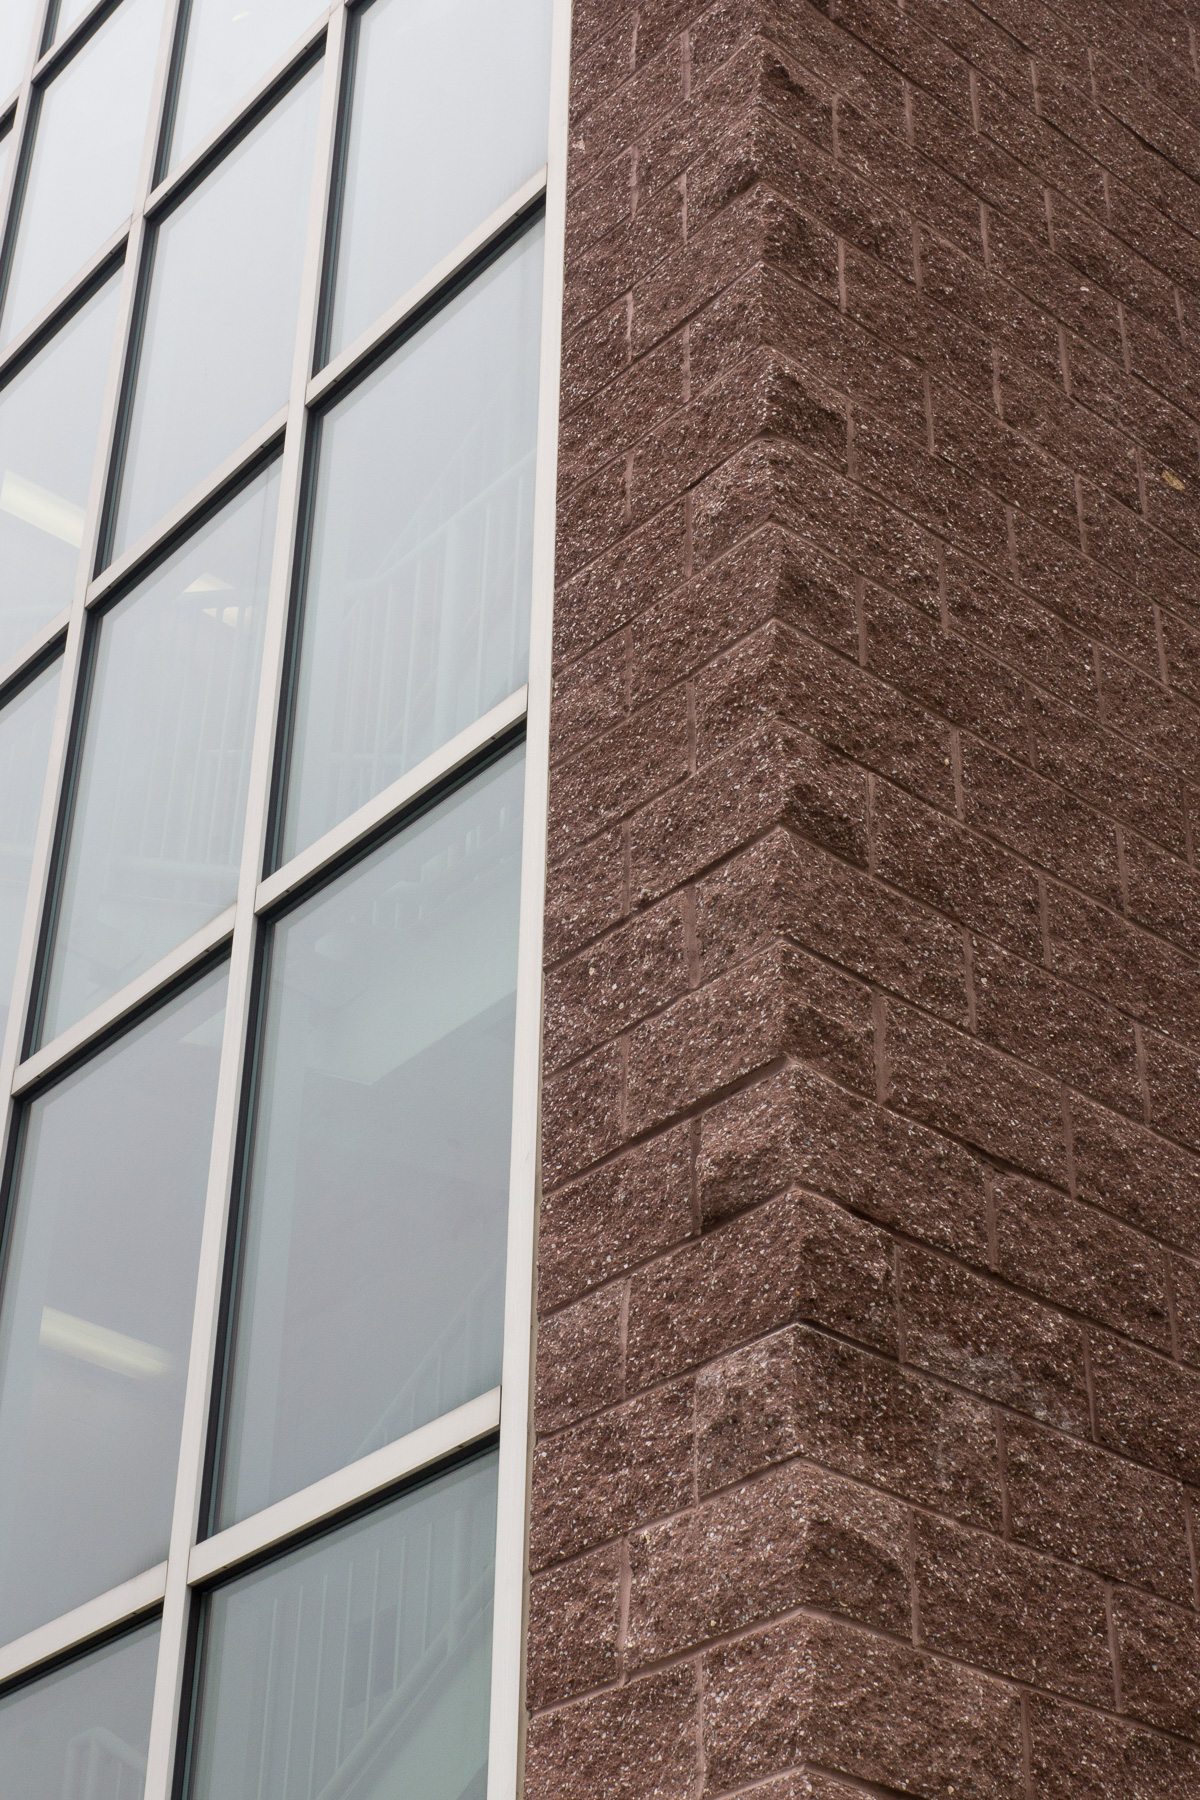 Glass and Brick